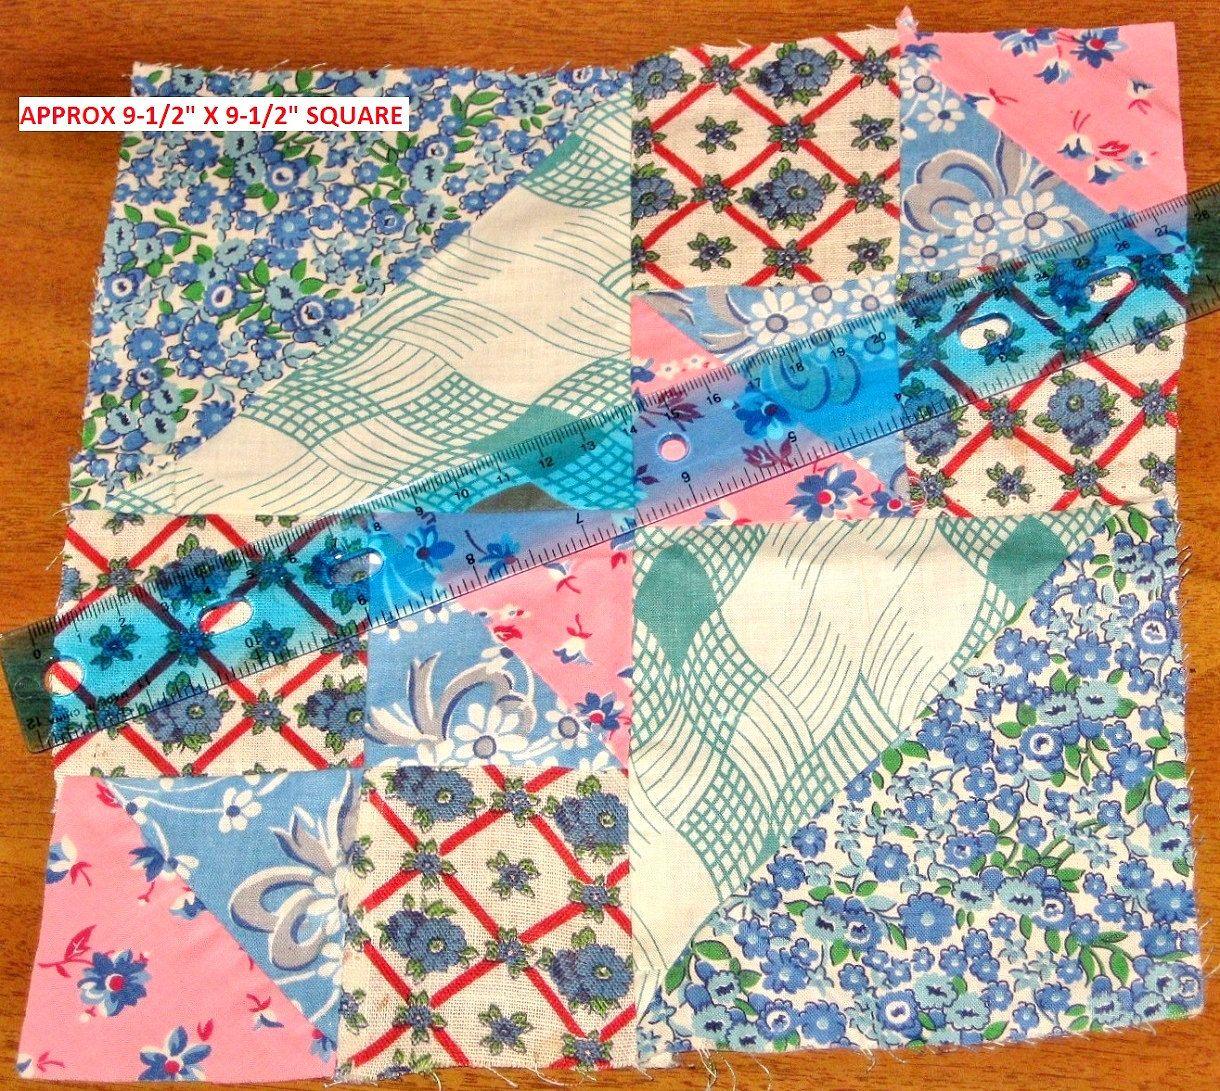 1930s-40s Vintage Quilt Block Feedsack Fabric Cotton Geometric Print ...